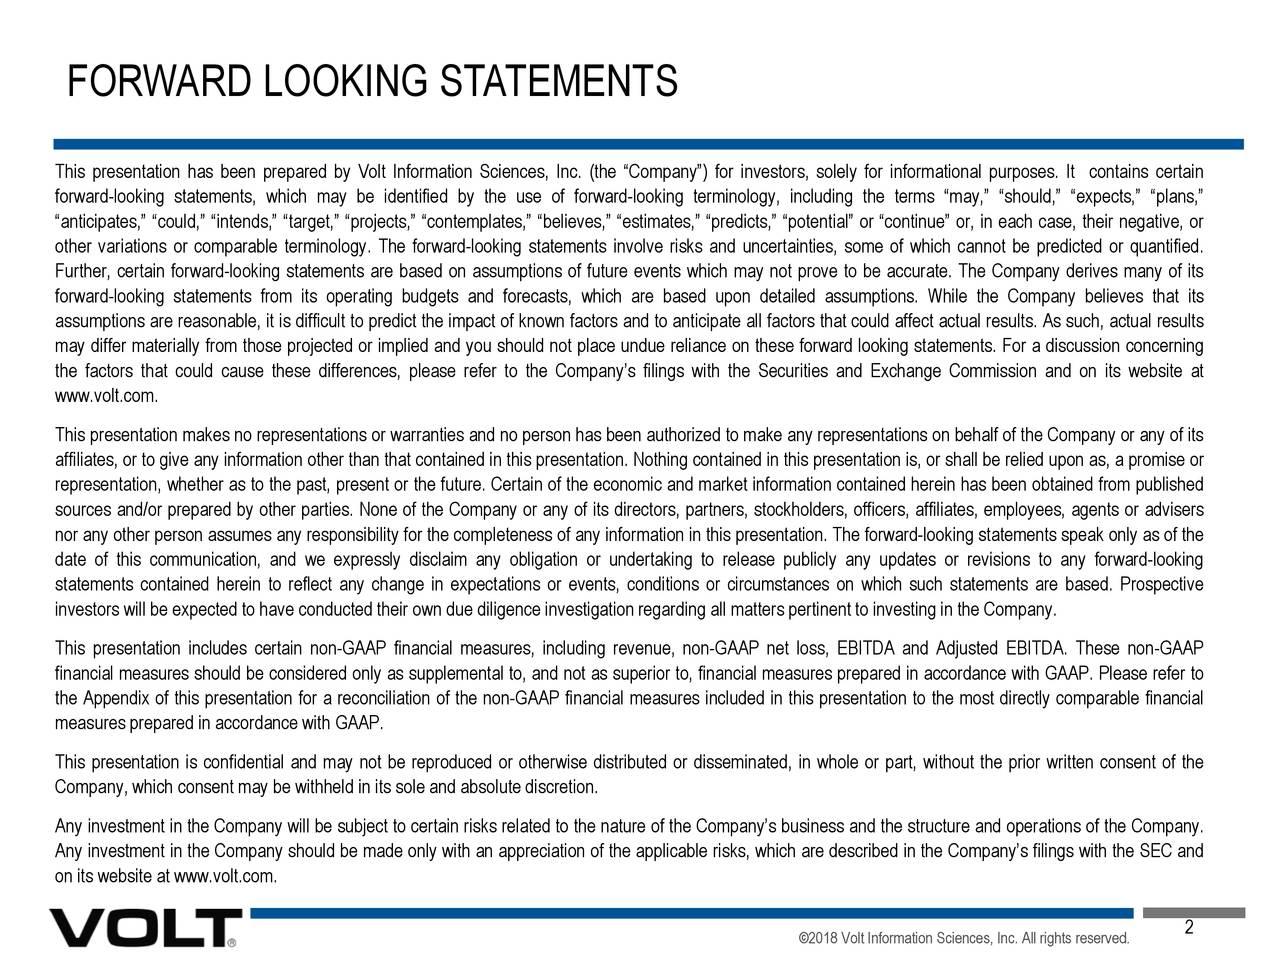 Volt Information Sciences, Inc. 2018 Q3